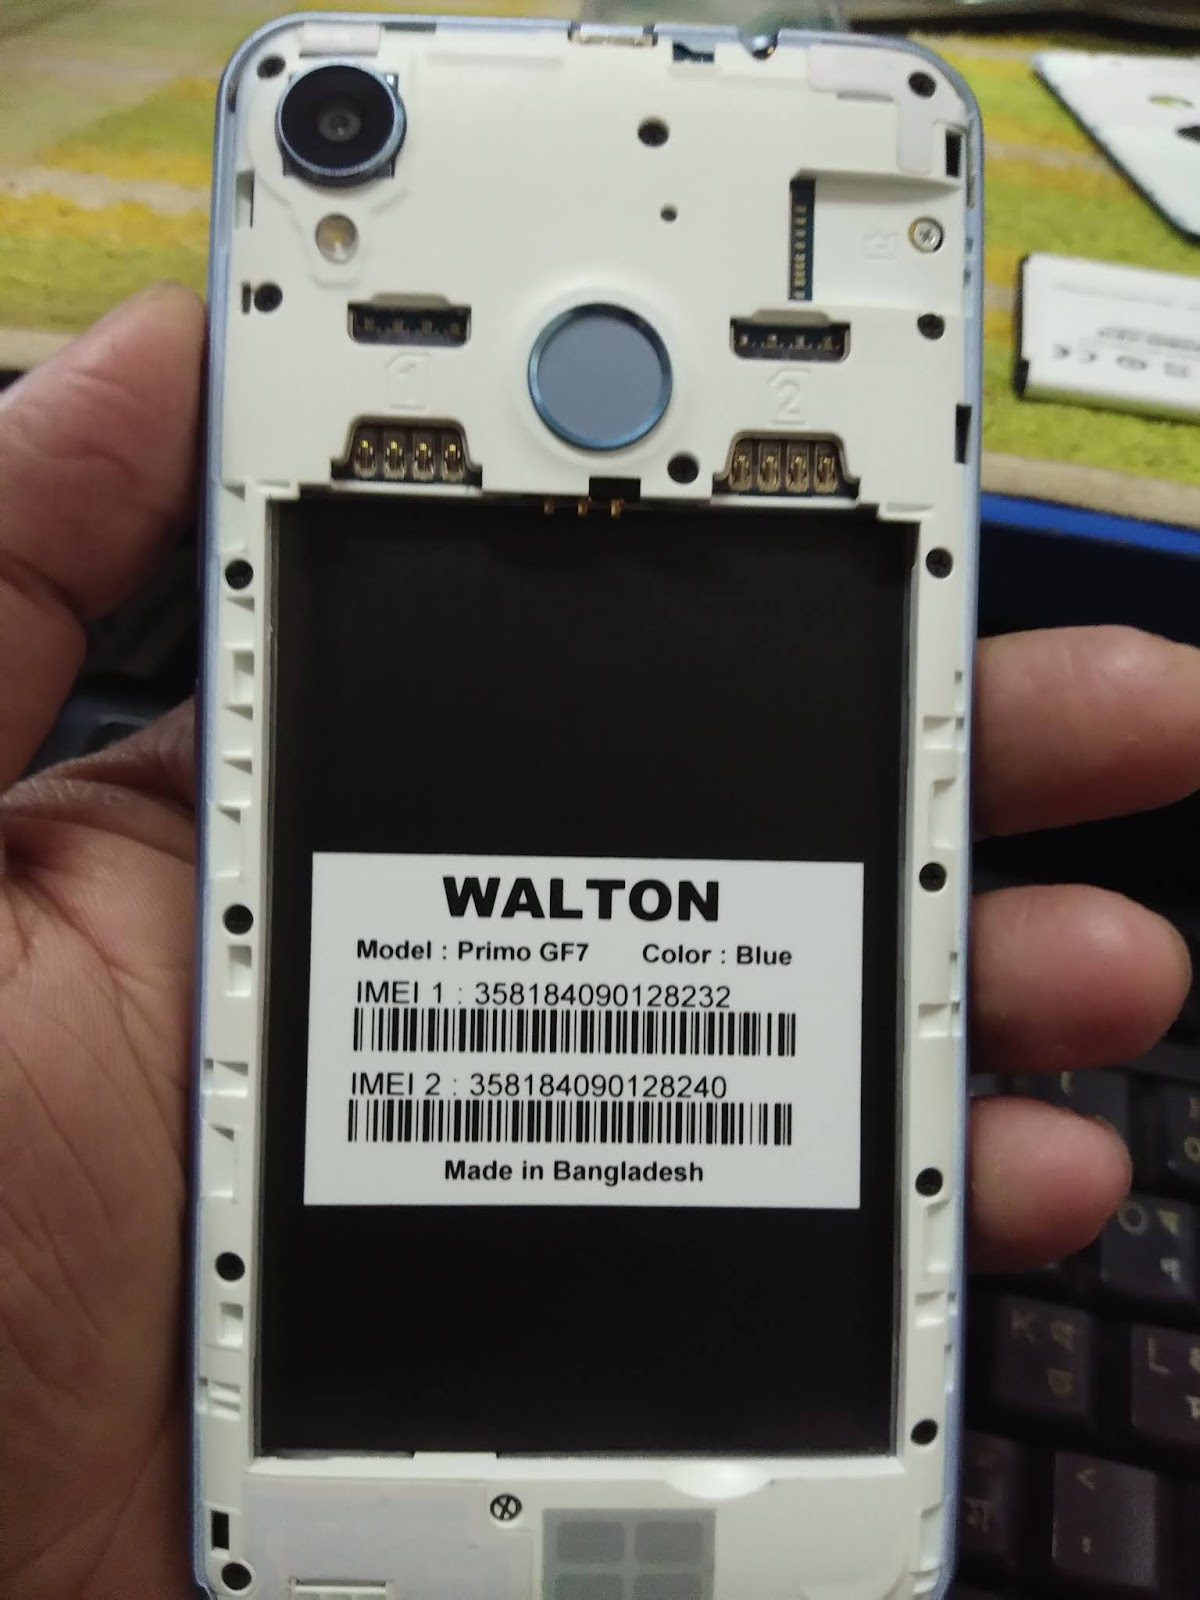 Walton Primo GF7 Customer Care Firmware